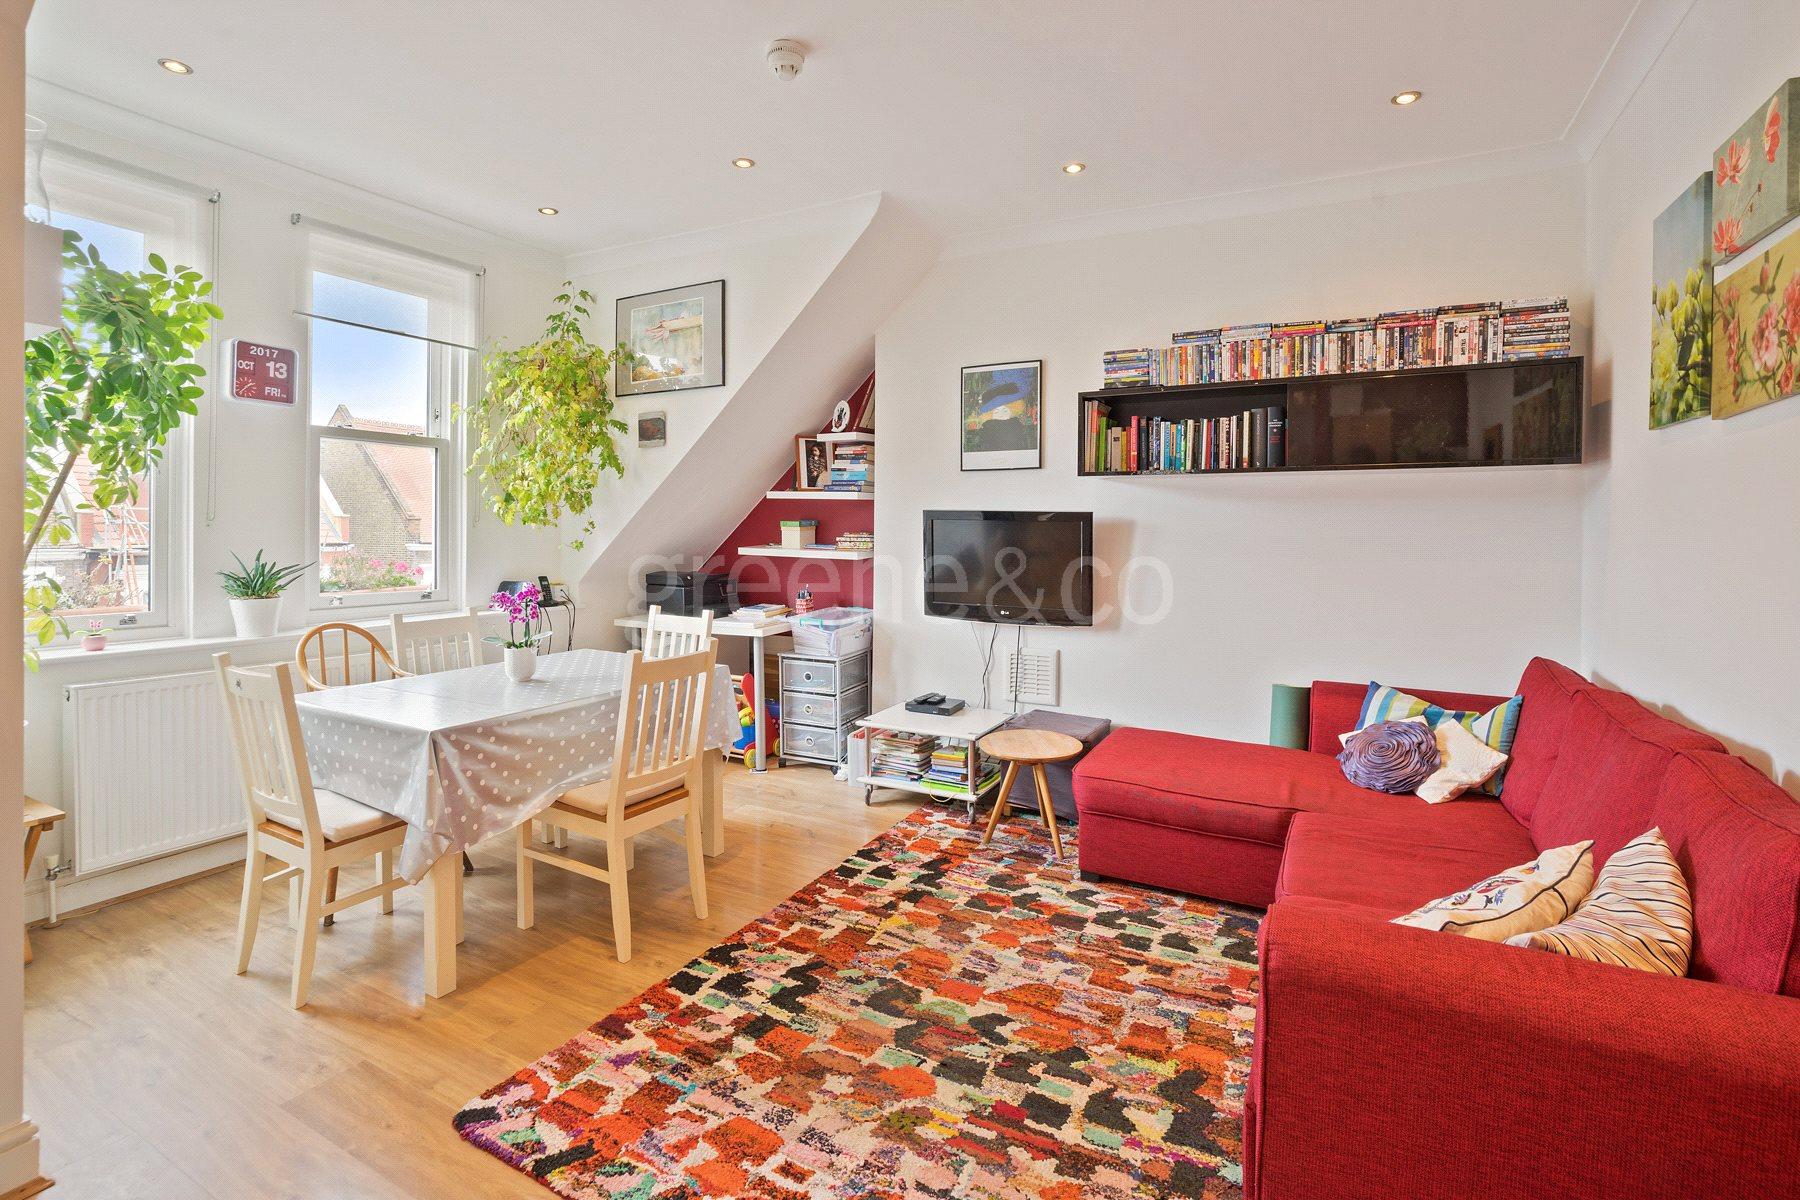 2 Bedrooms Maisonette Flat for sale in Buckley Road, Kilburn, London, NW6